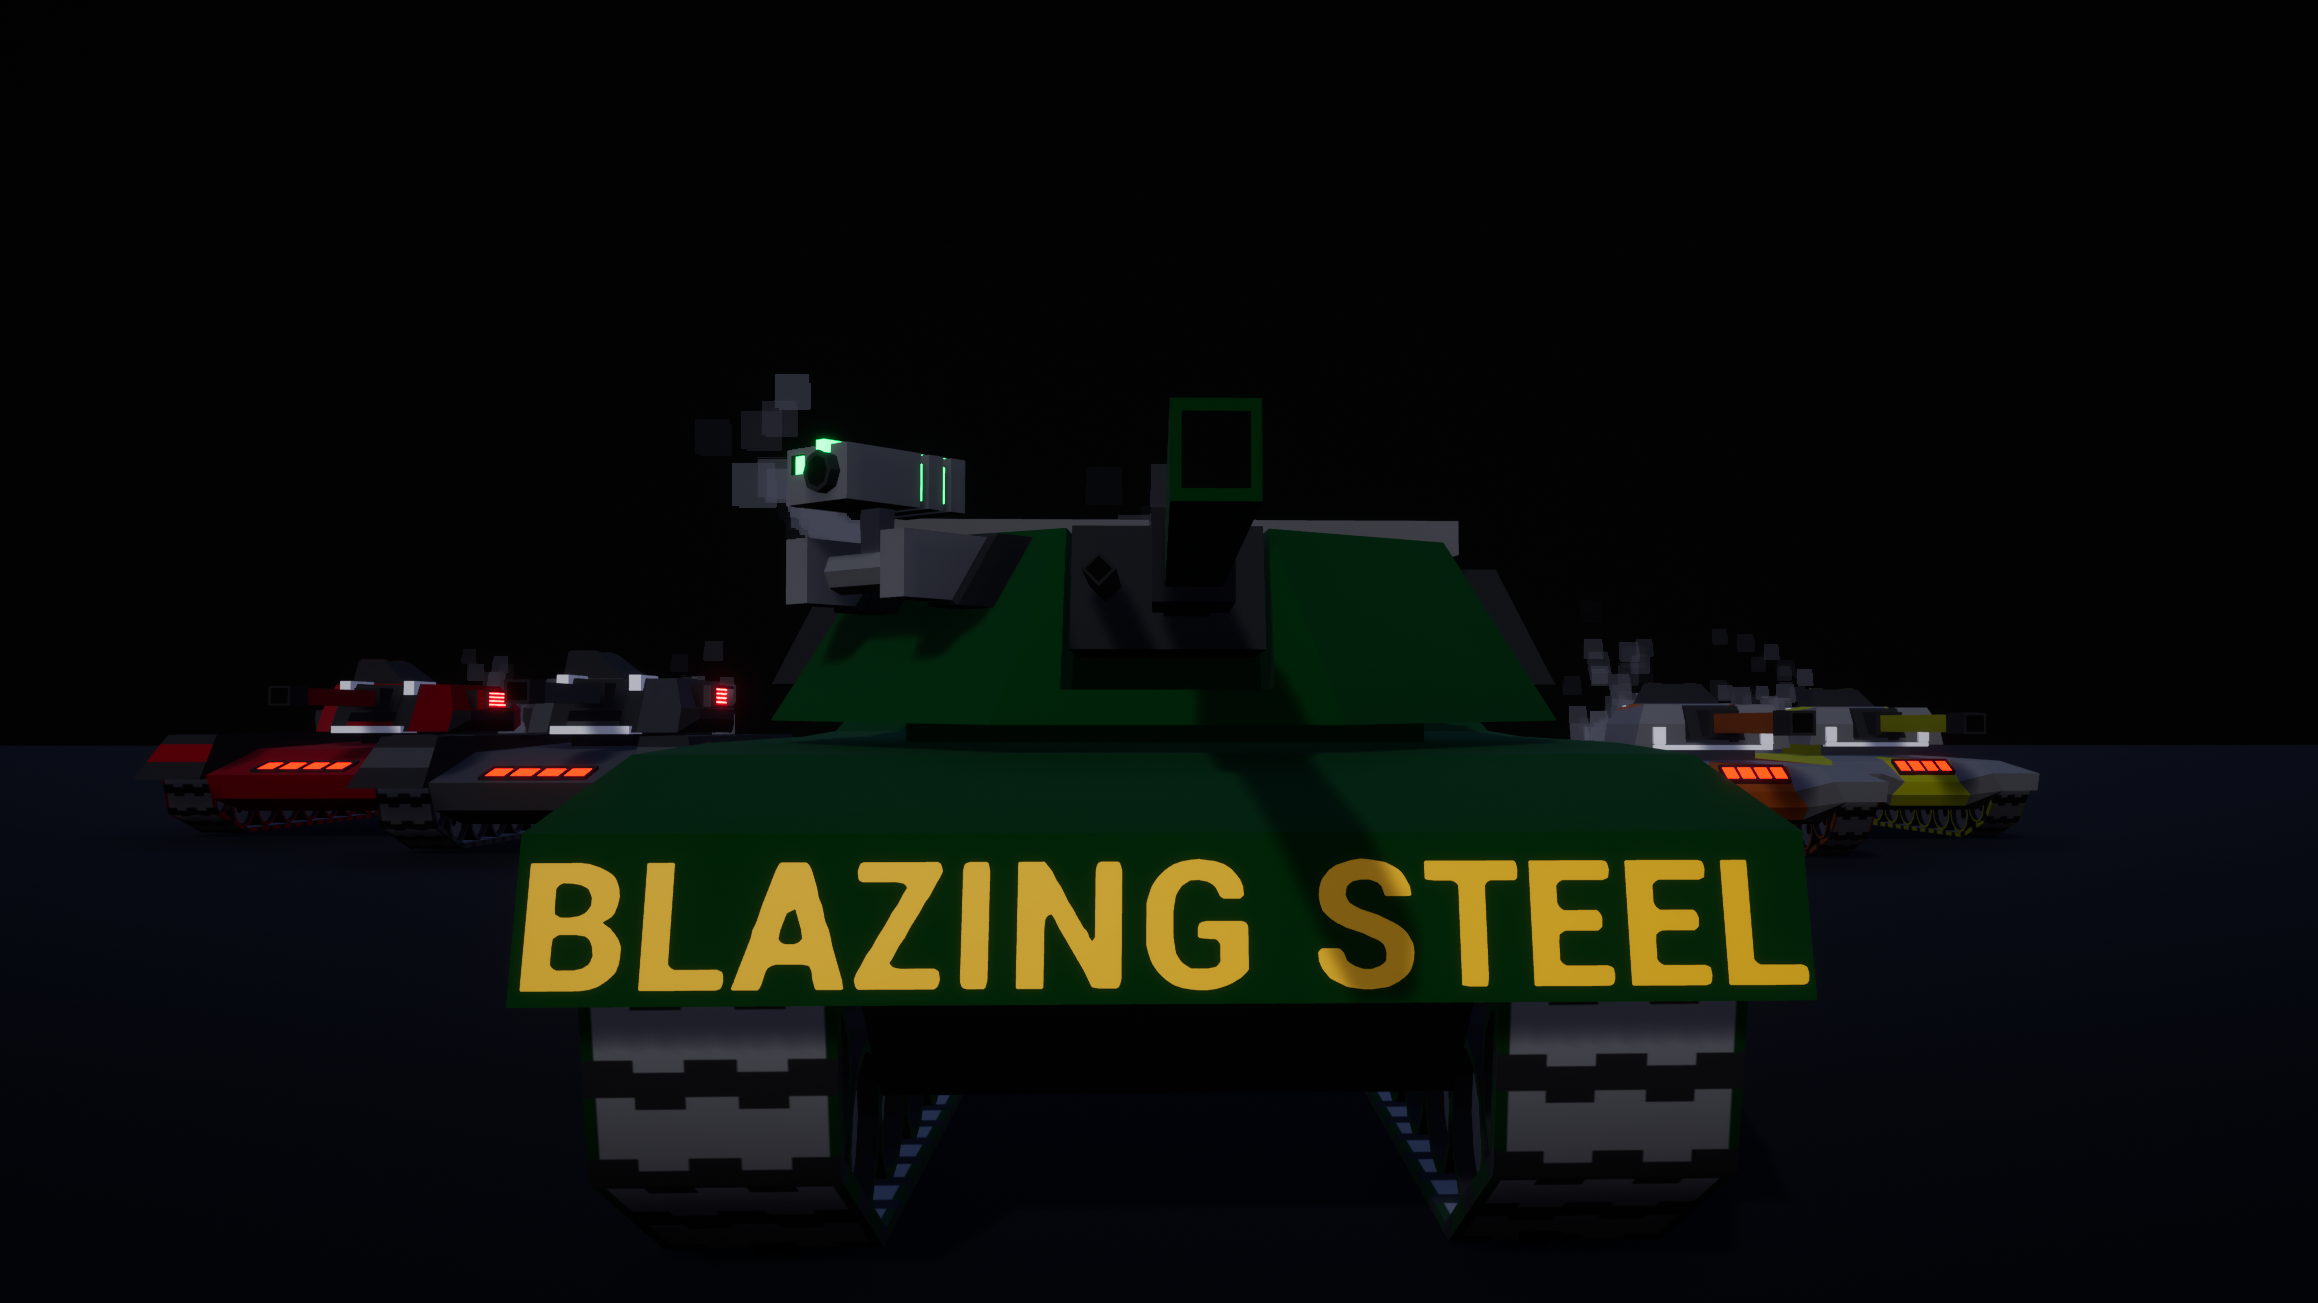 BLAZING STEEL